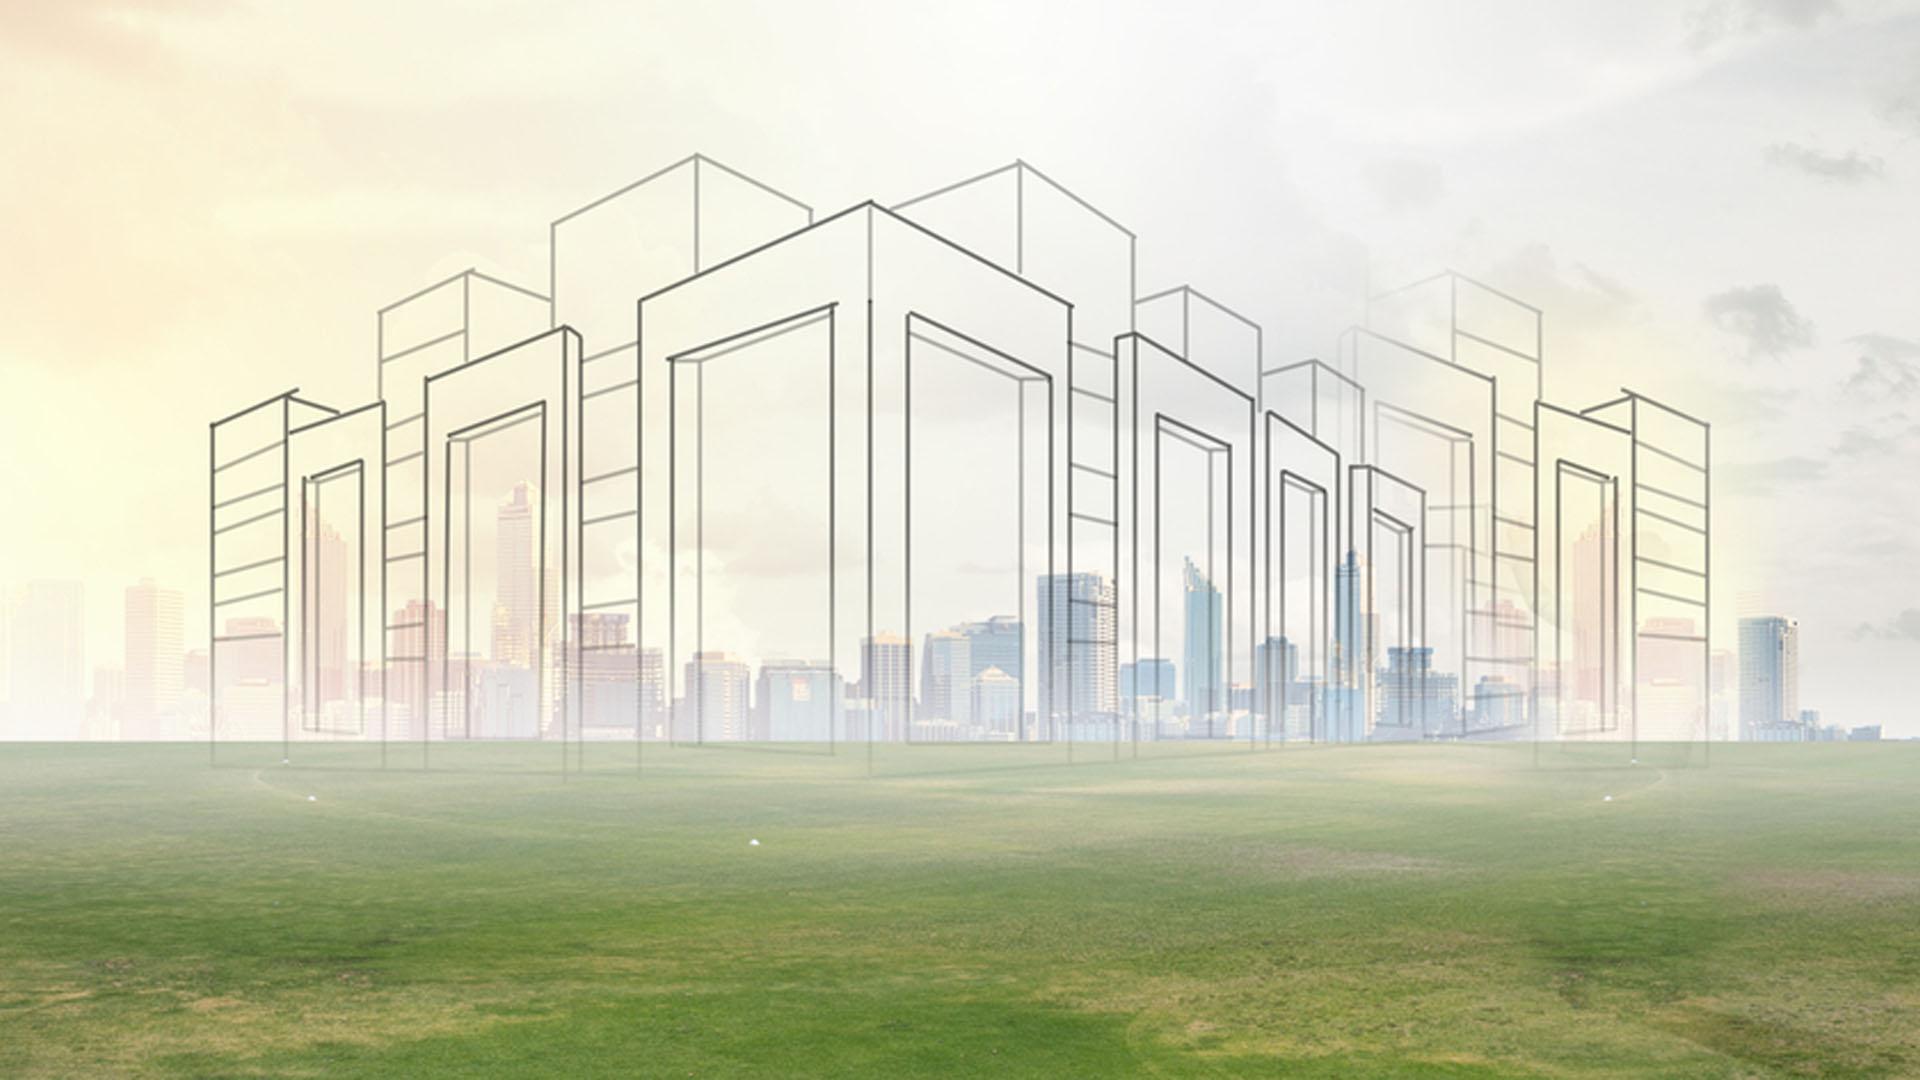 infrastructure-building-construction-architechture-engineering-design